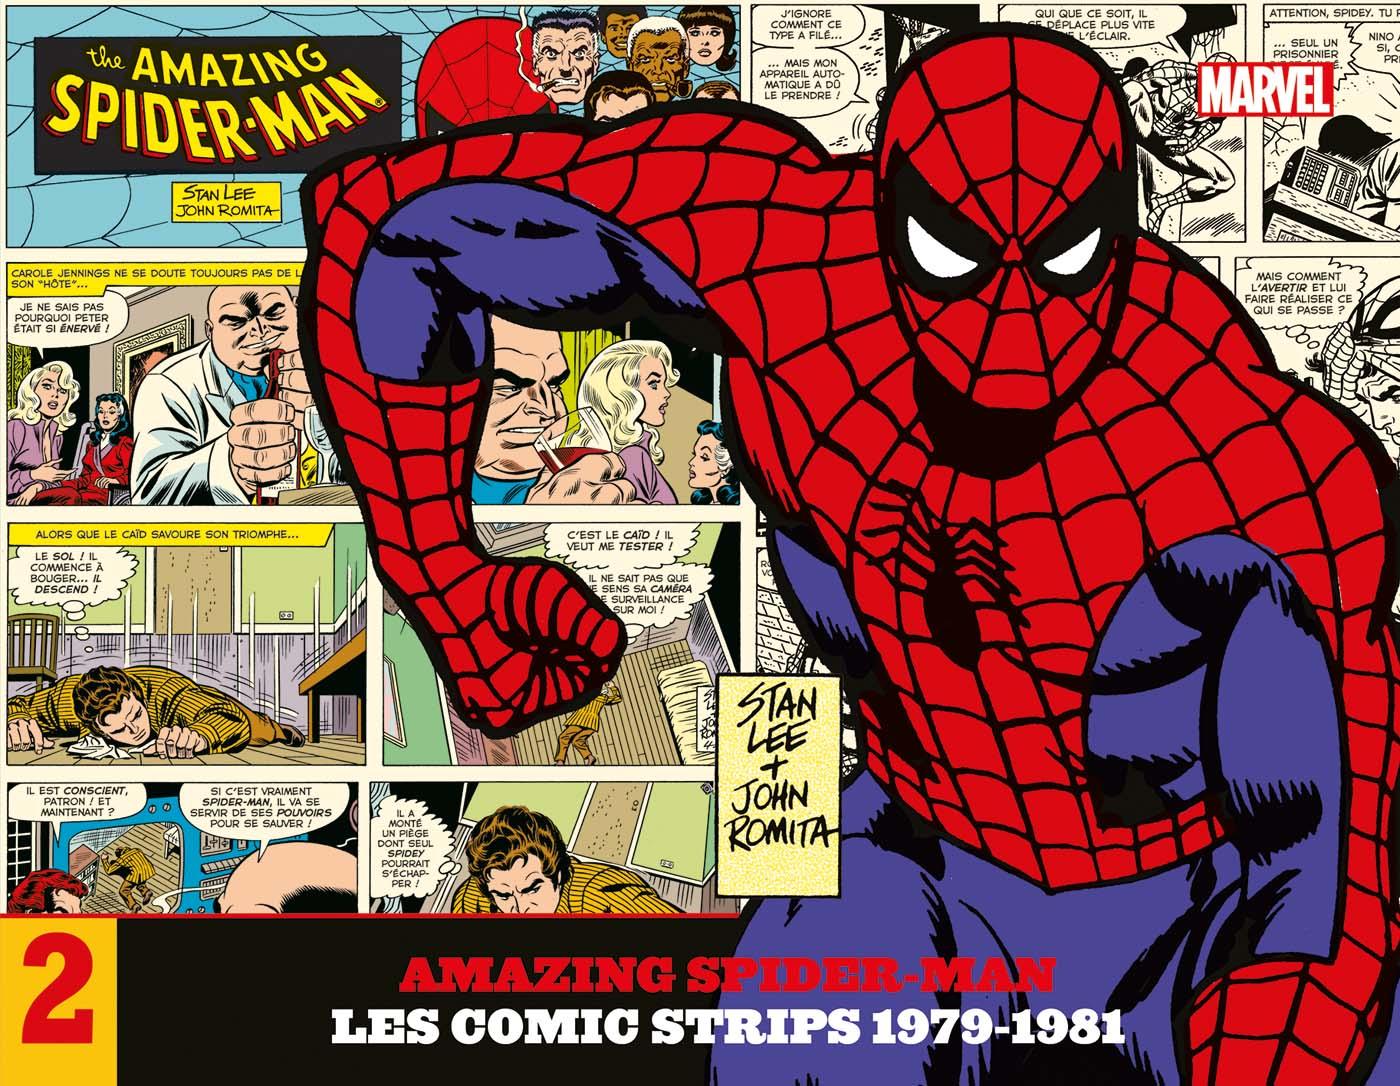 Amazing Spider-Man - Les comic strips 2 - 1979 - 1981